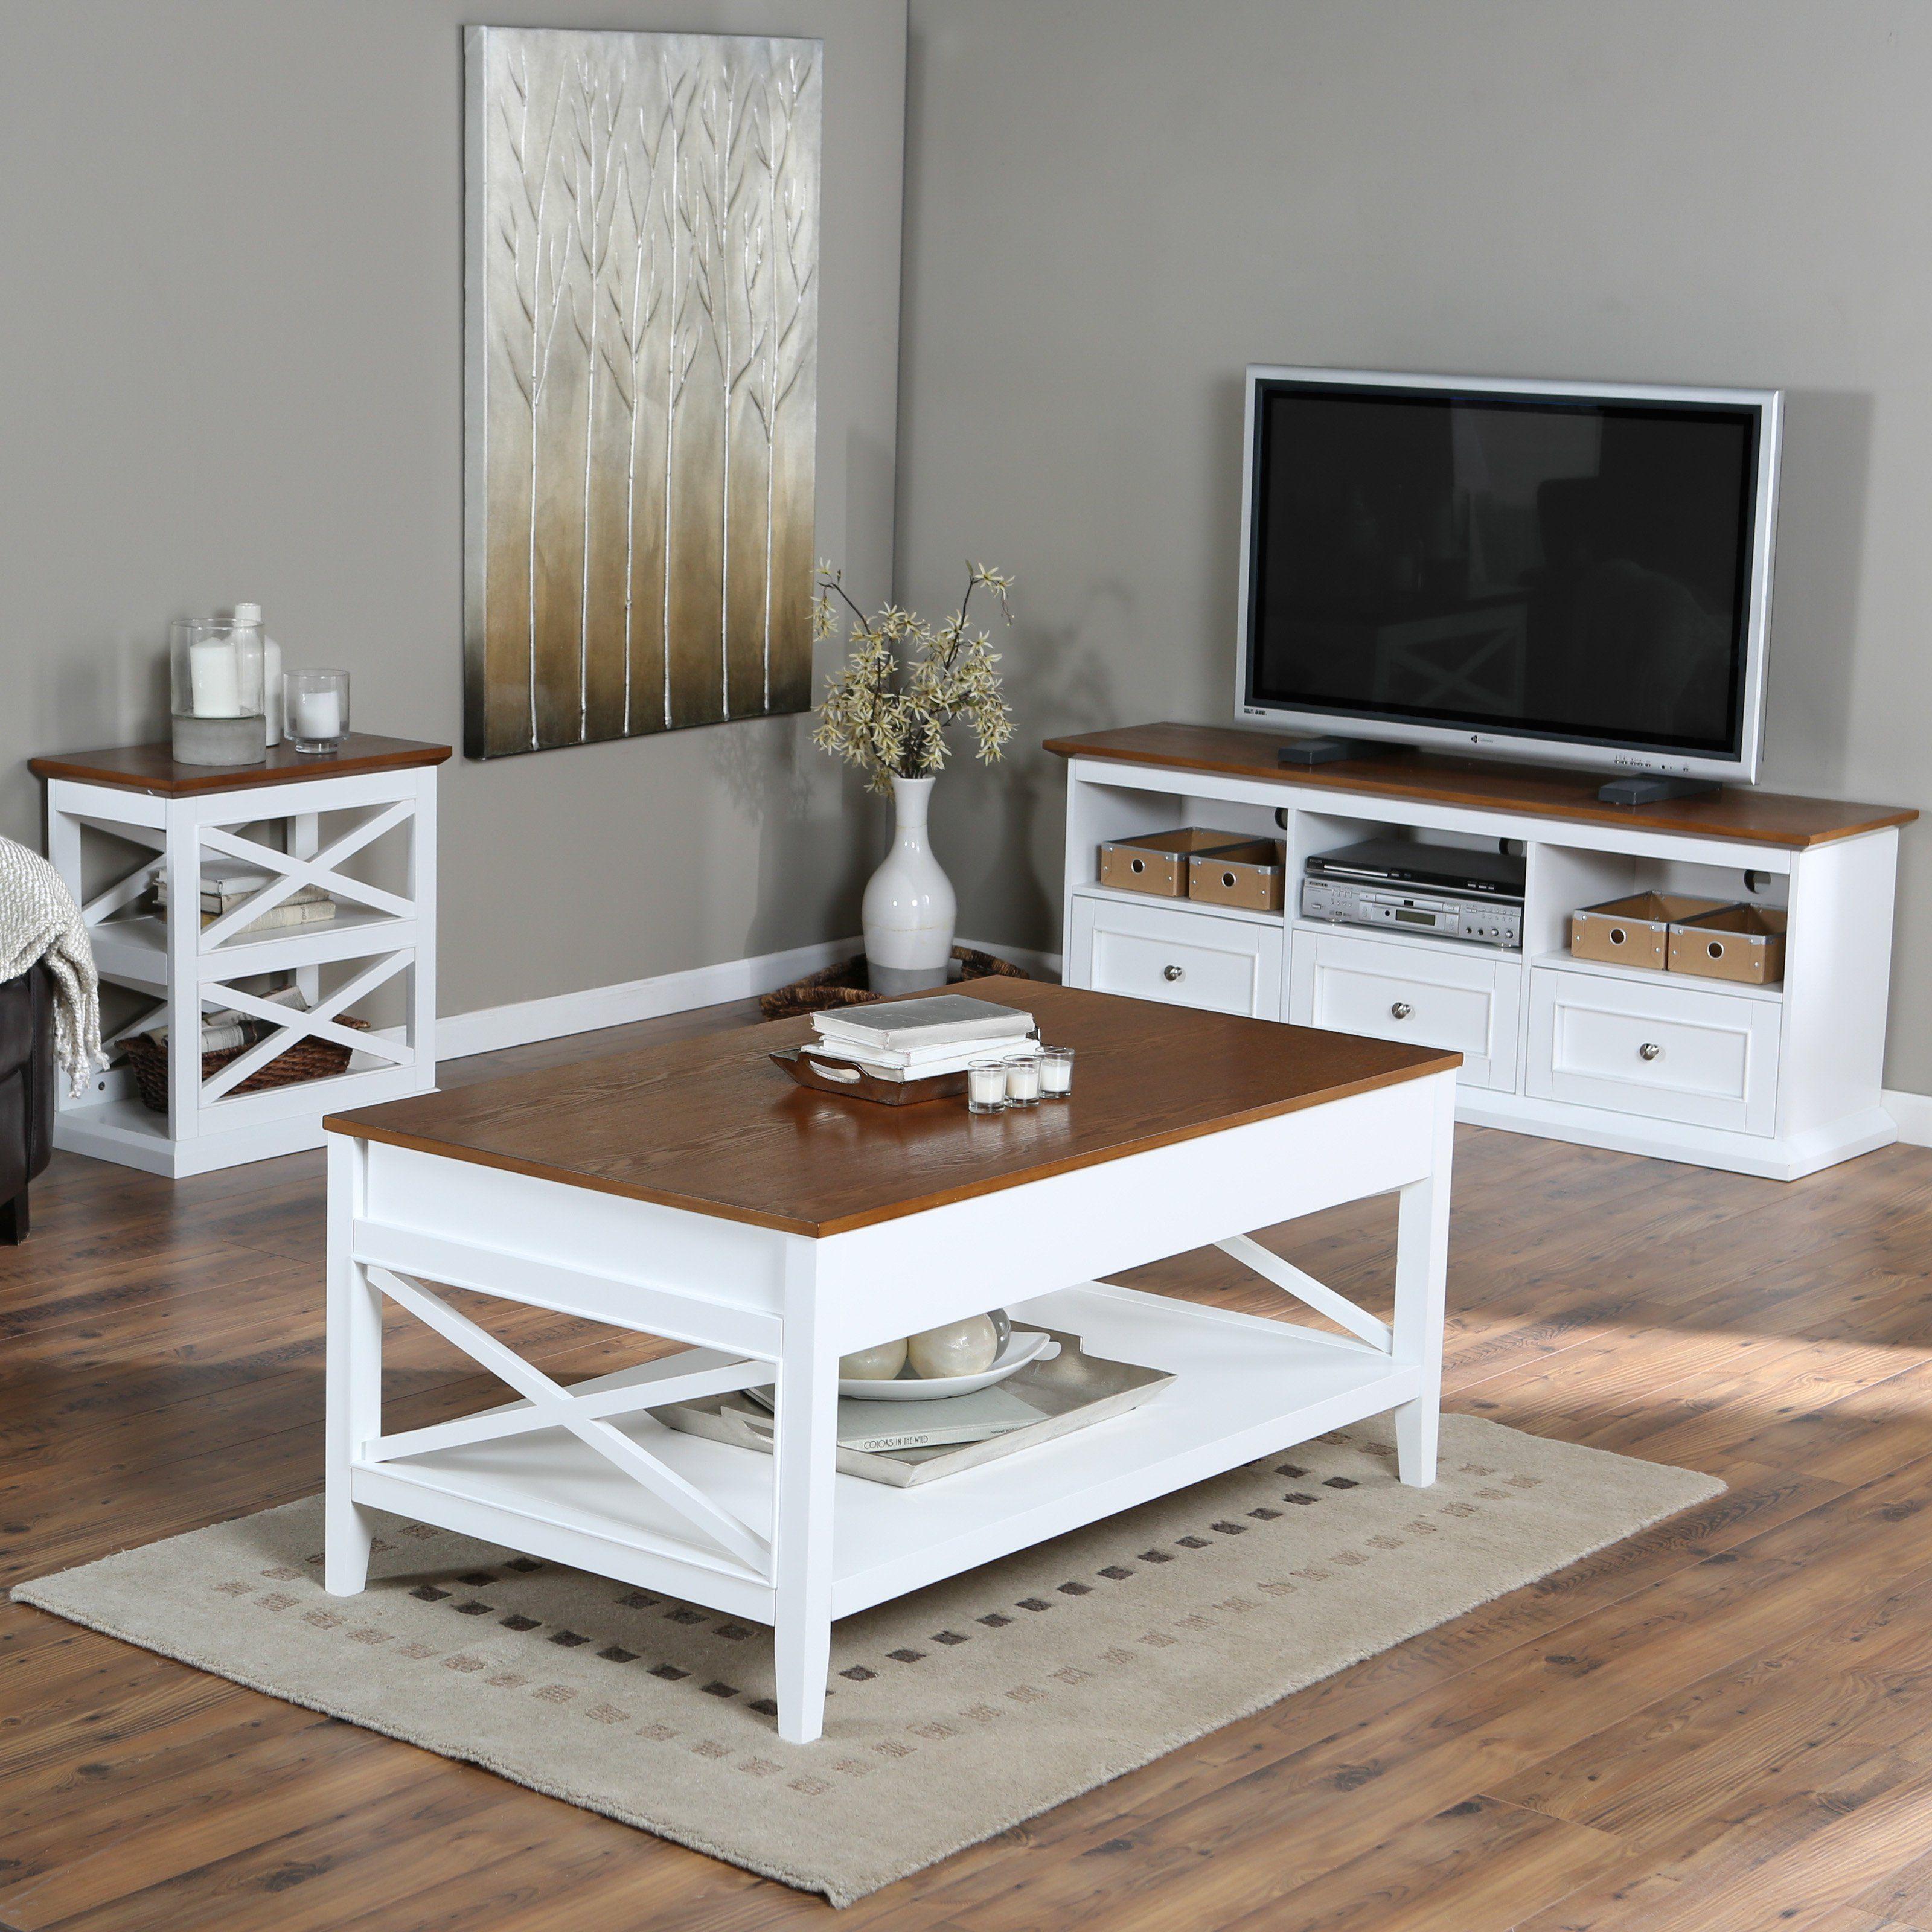 Belham living hampton living room collection whiteoak 87599 belham living hampton living room collection whiteoak 87599 hayneedle coffee table geotapseo Images